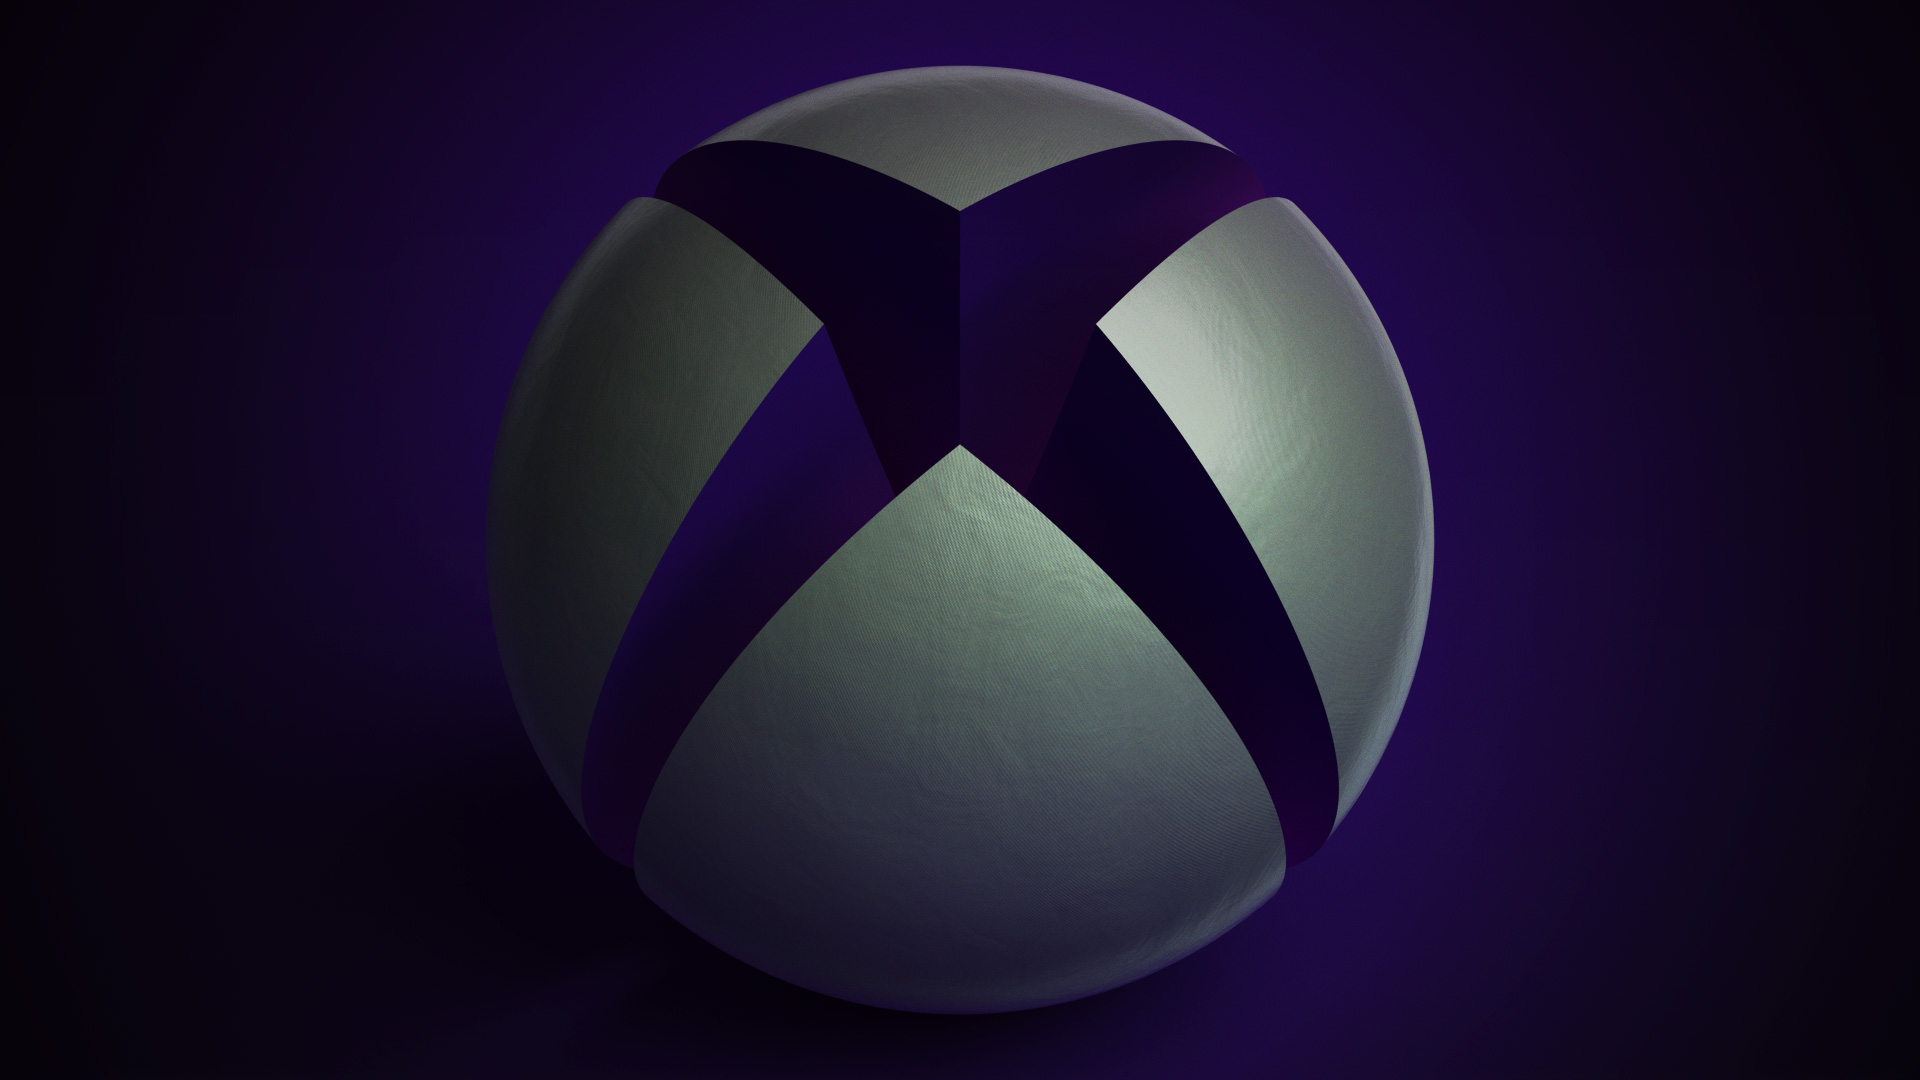 X1bg Giant Xbox Sphere Purple Dark Martin Crownover